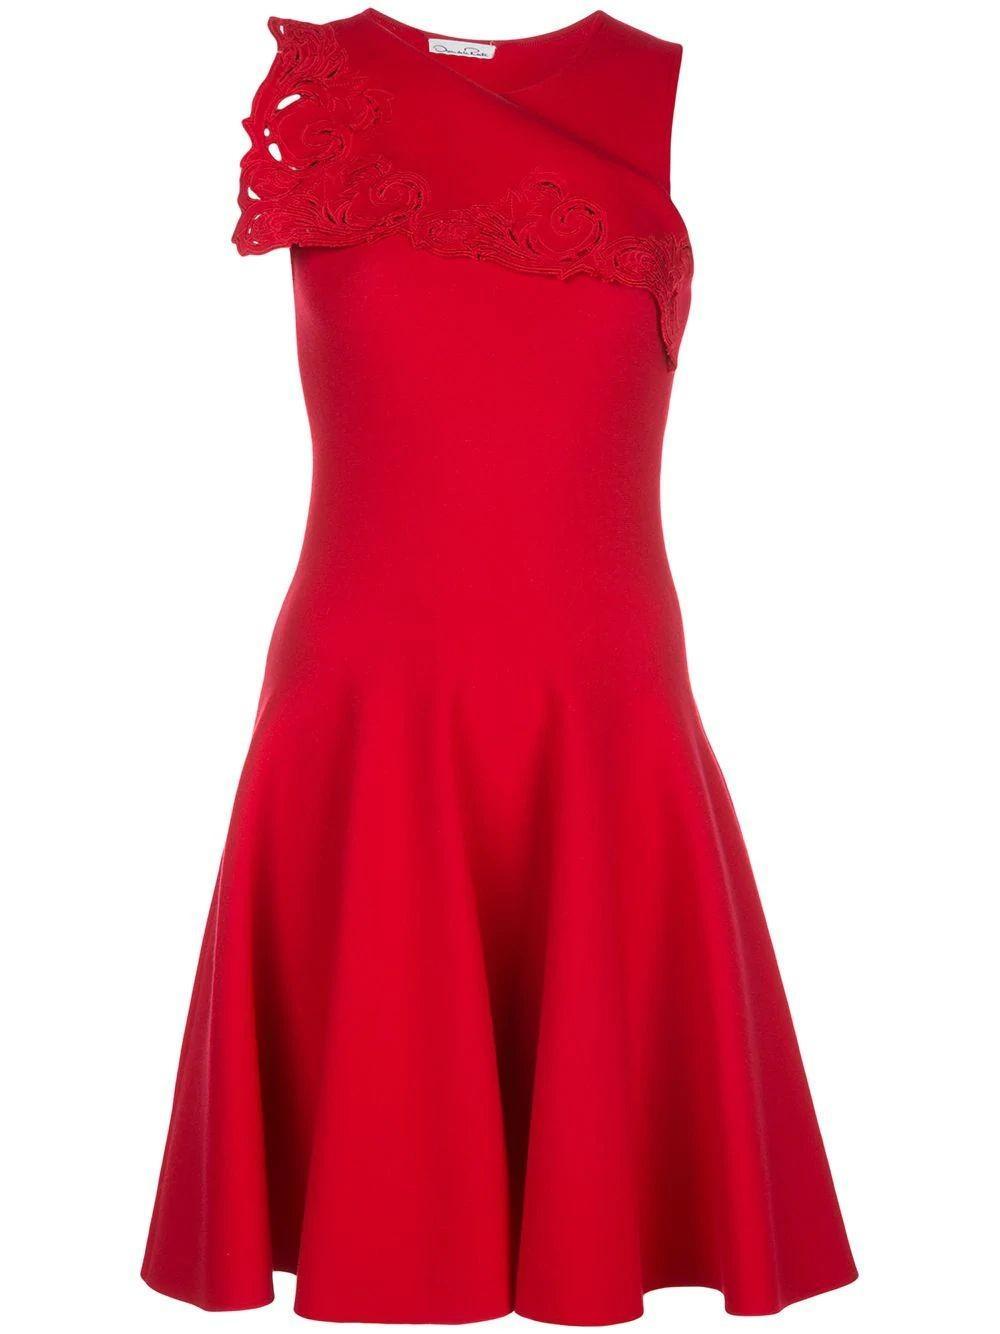 Foldover Sleeveless Dress Item # 20PE1702LCS